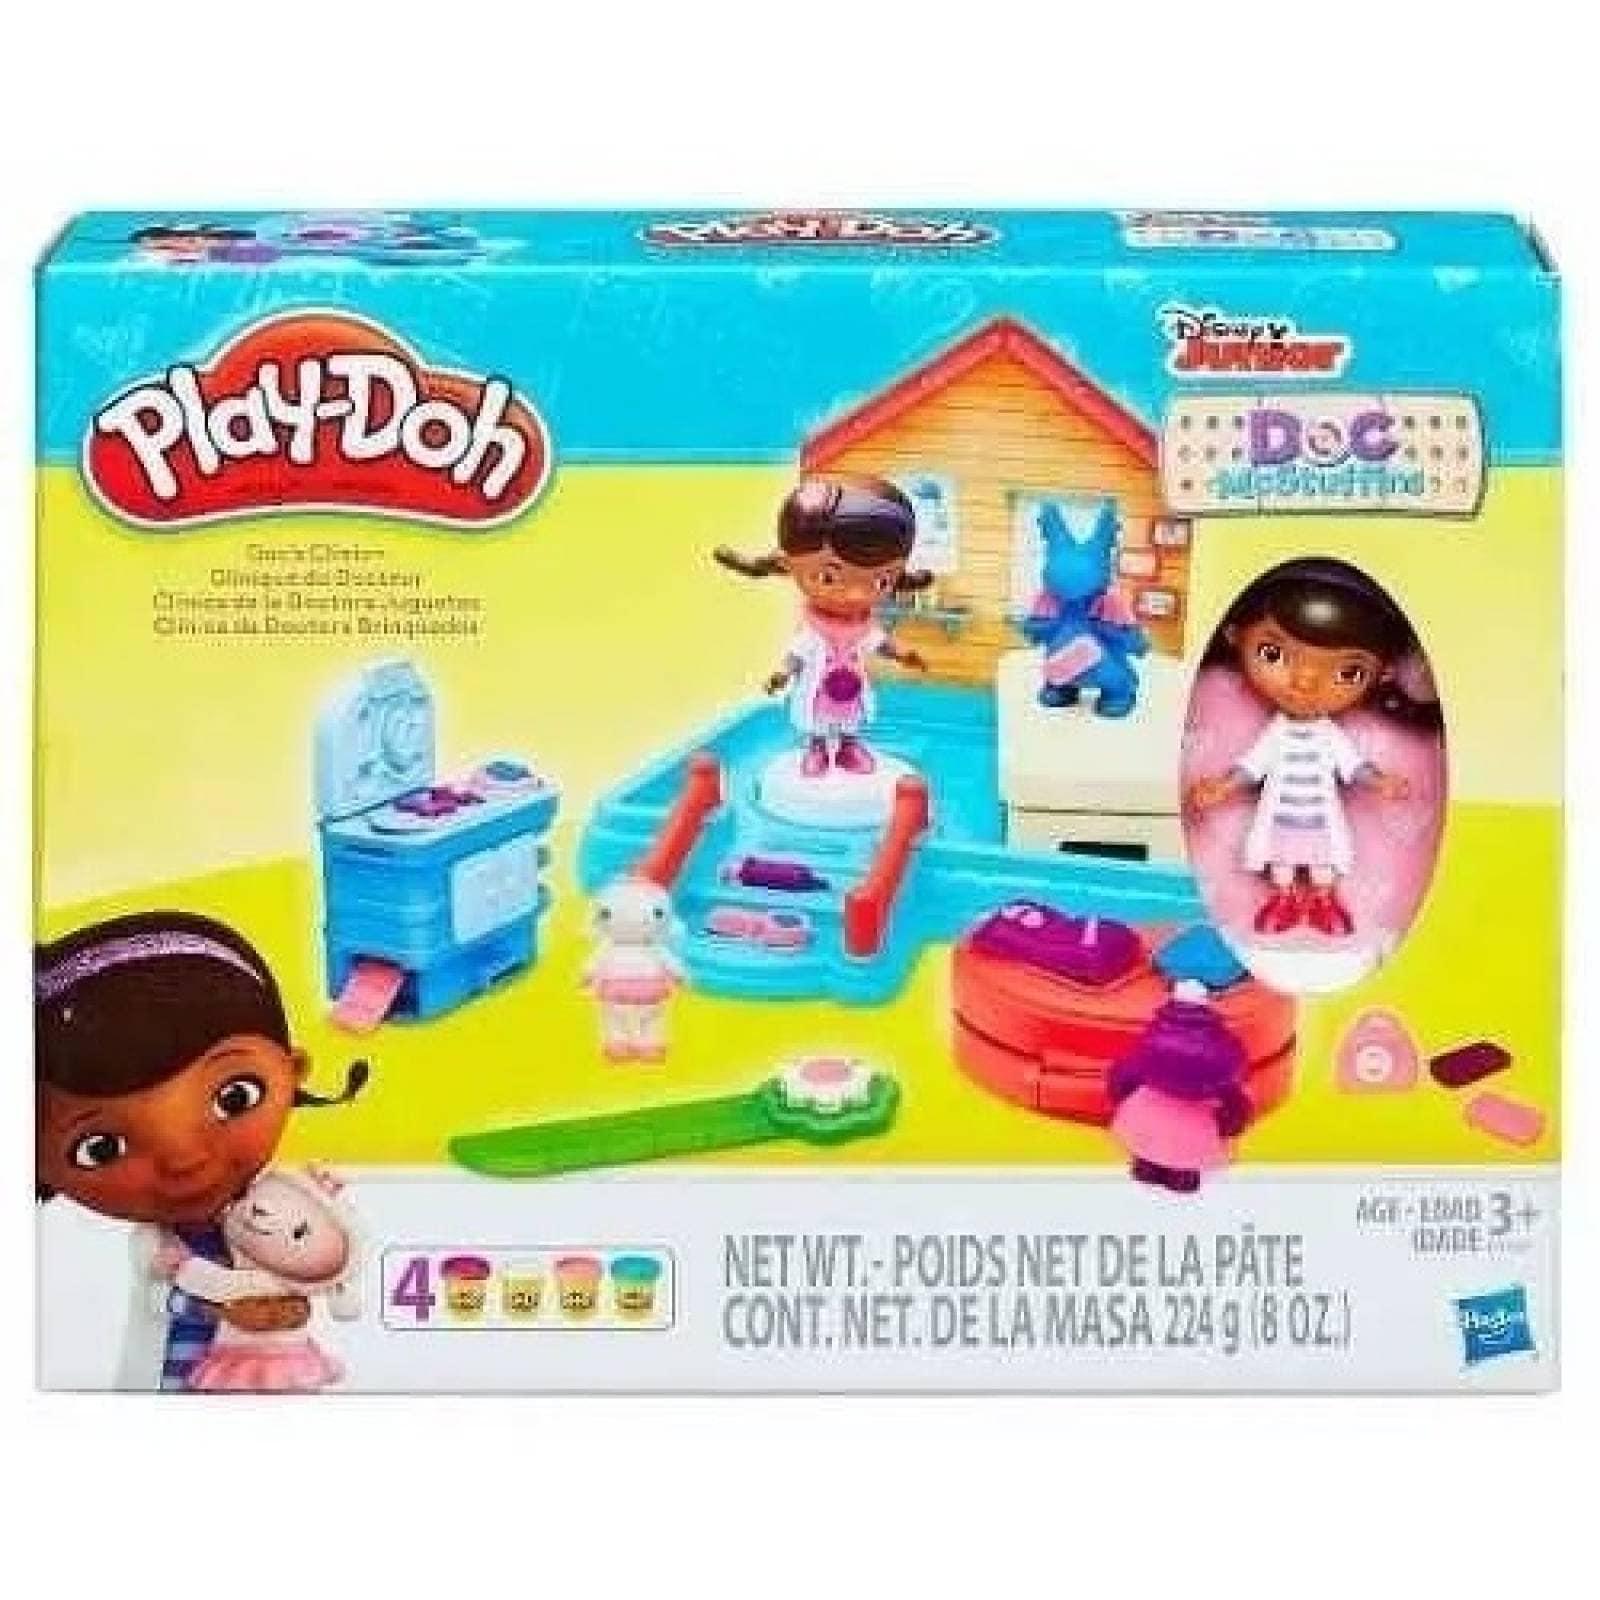 Play Doh Clínica Doctora Juguetes